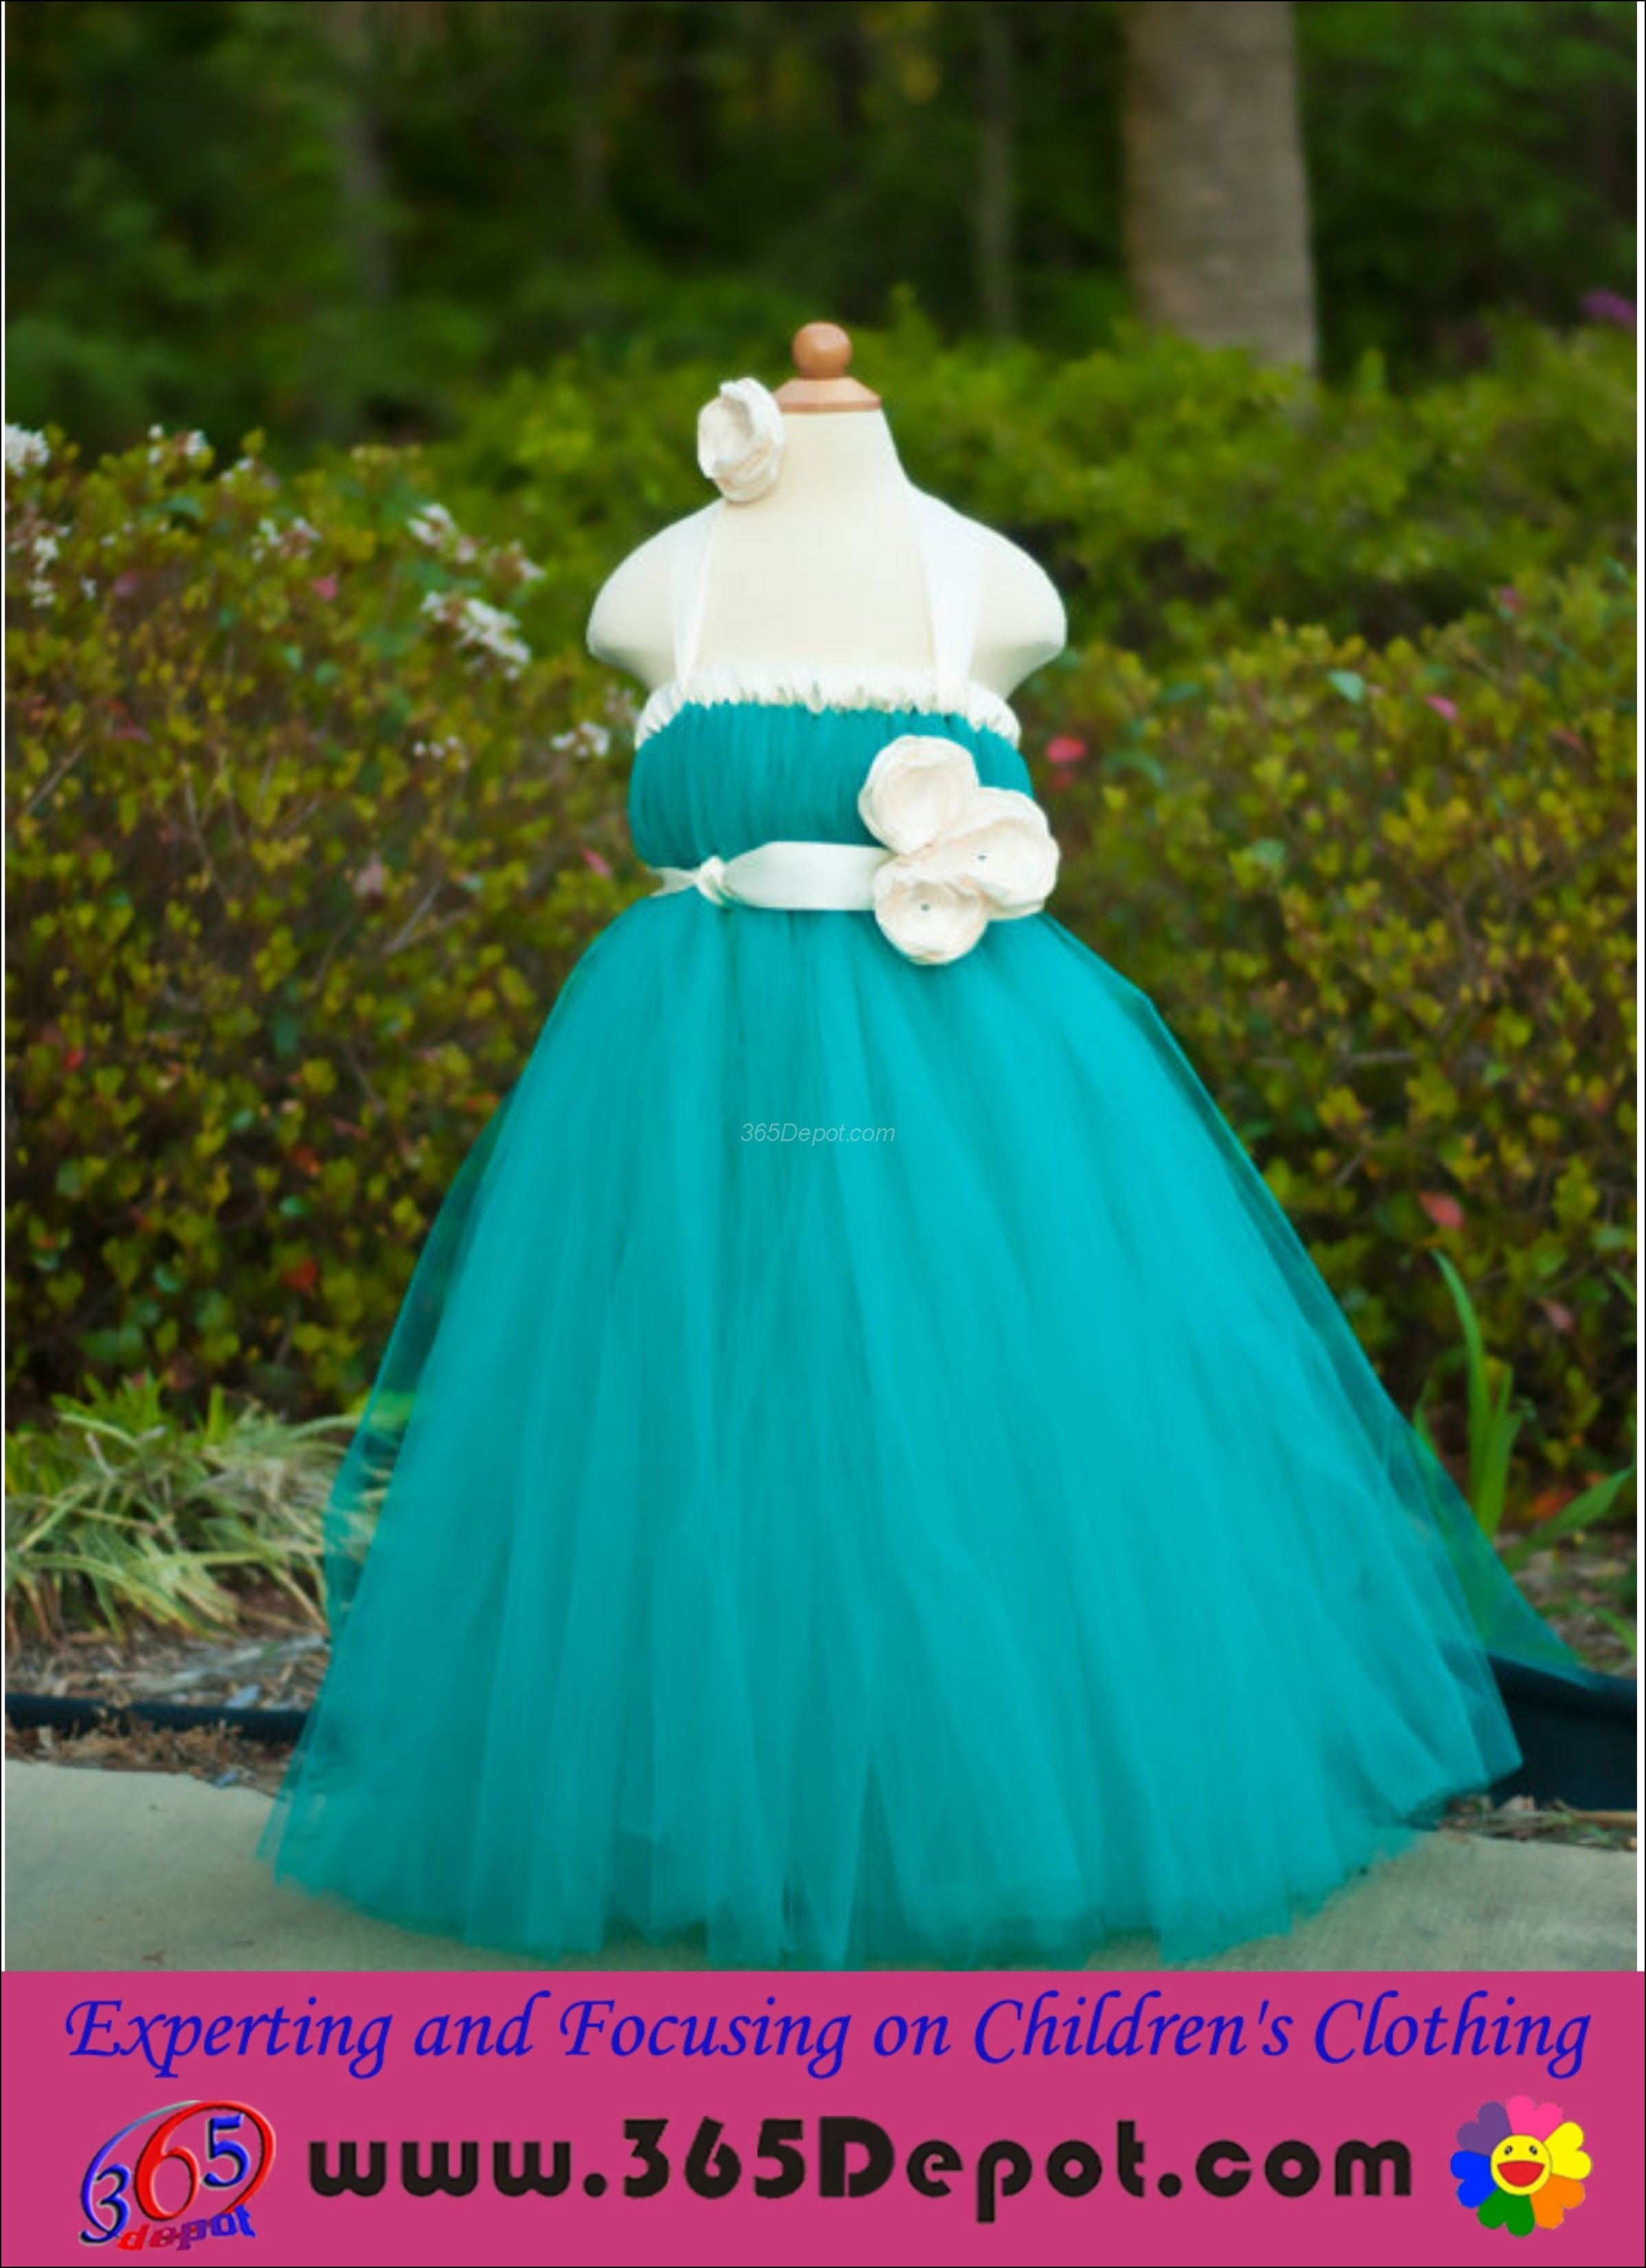 Cute Baby Dresses for Weddings   Wedding Ideas   Pinterest   Weddings